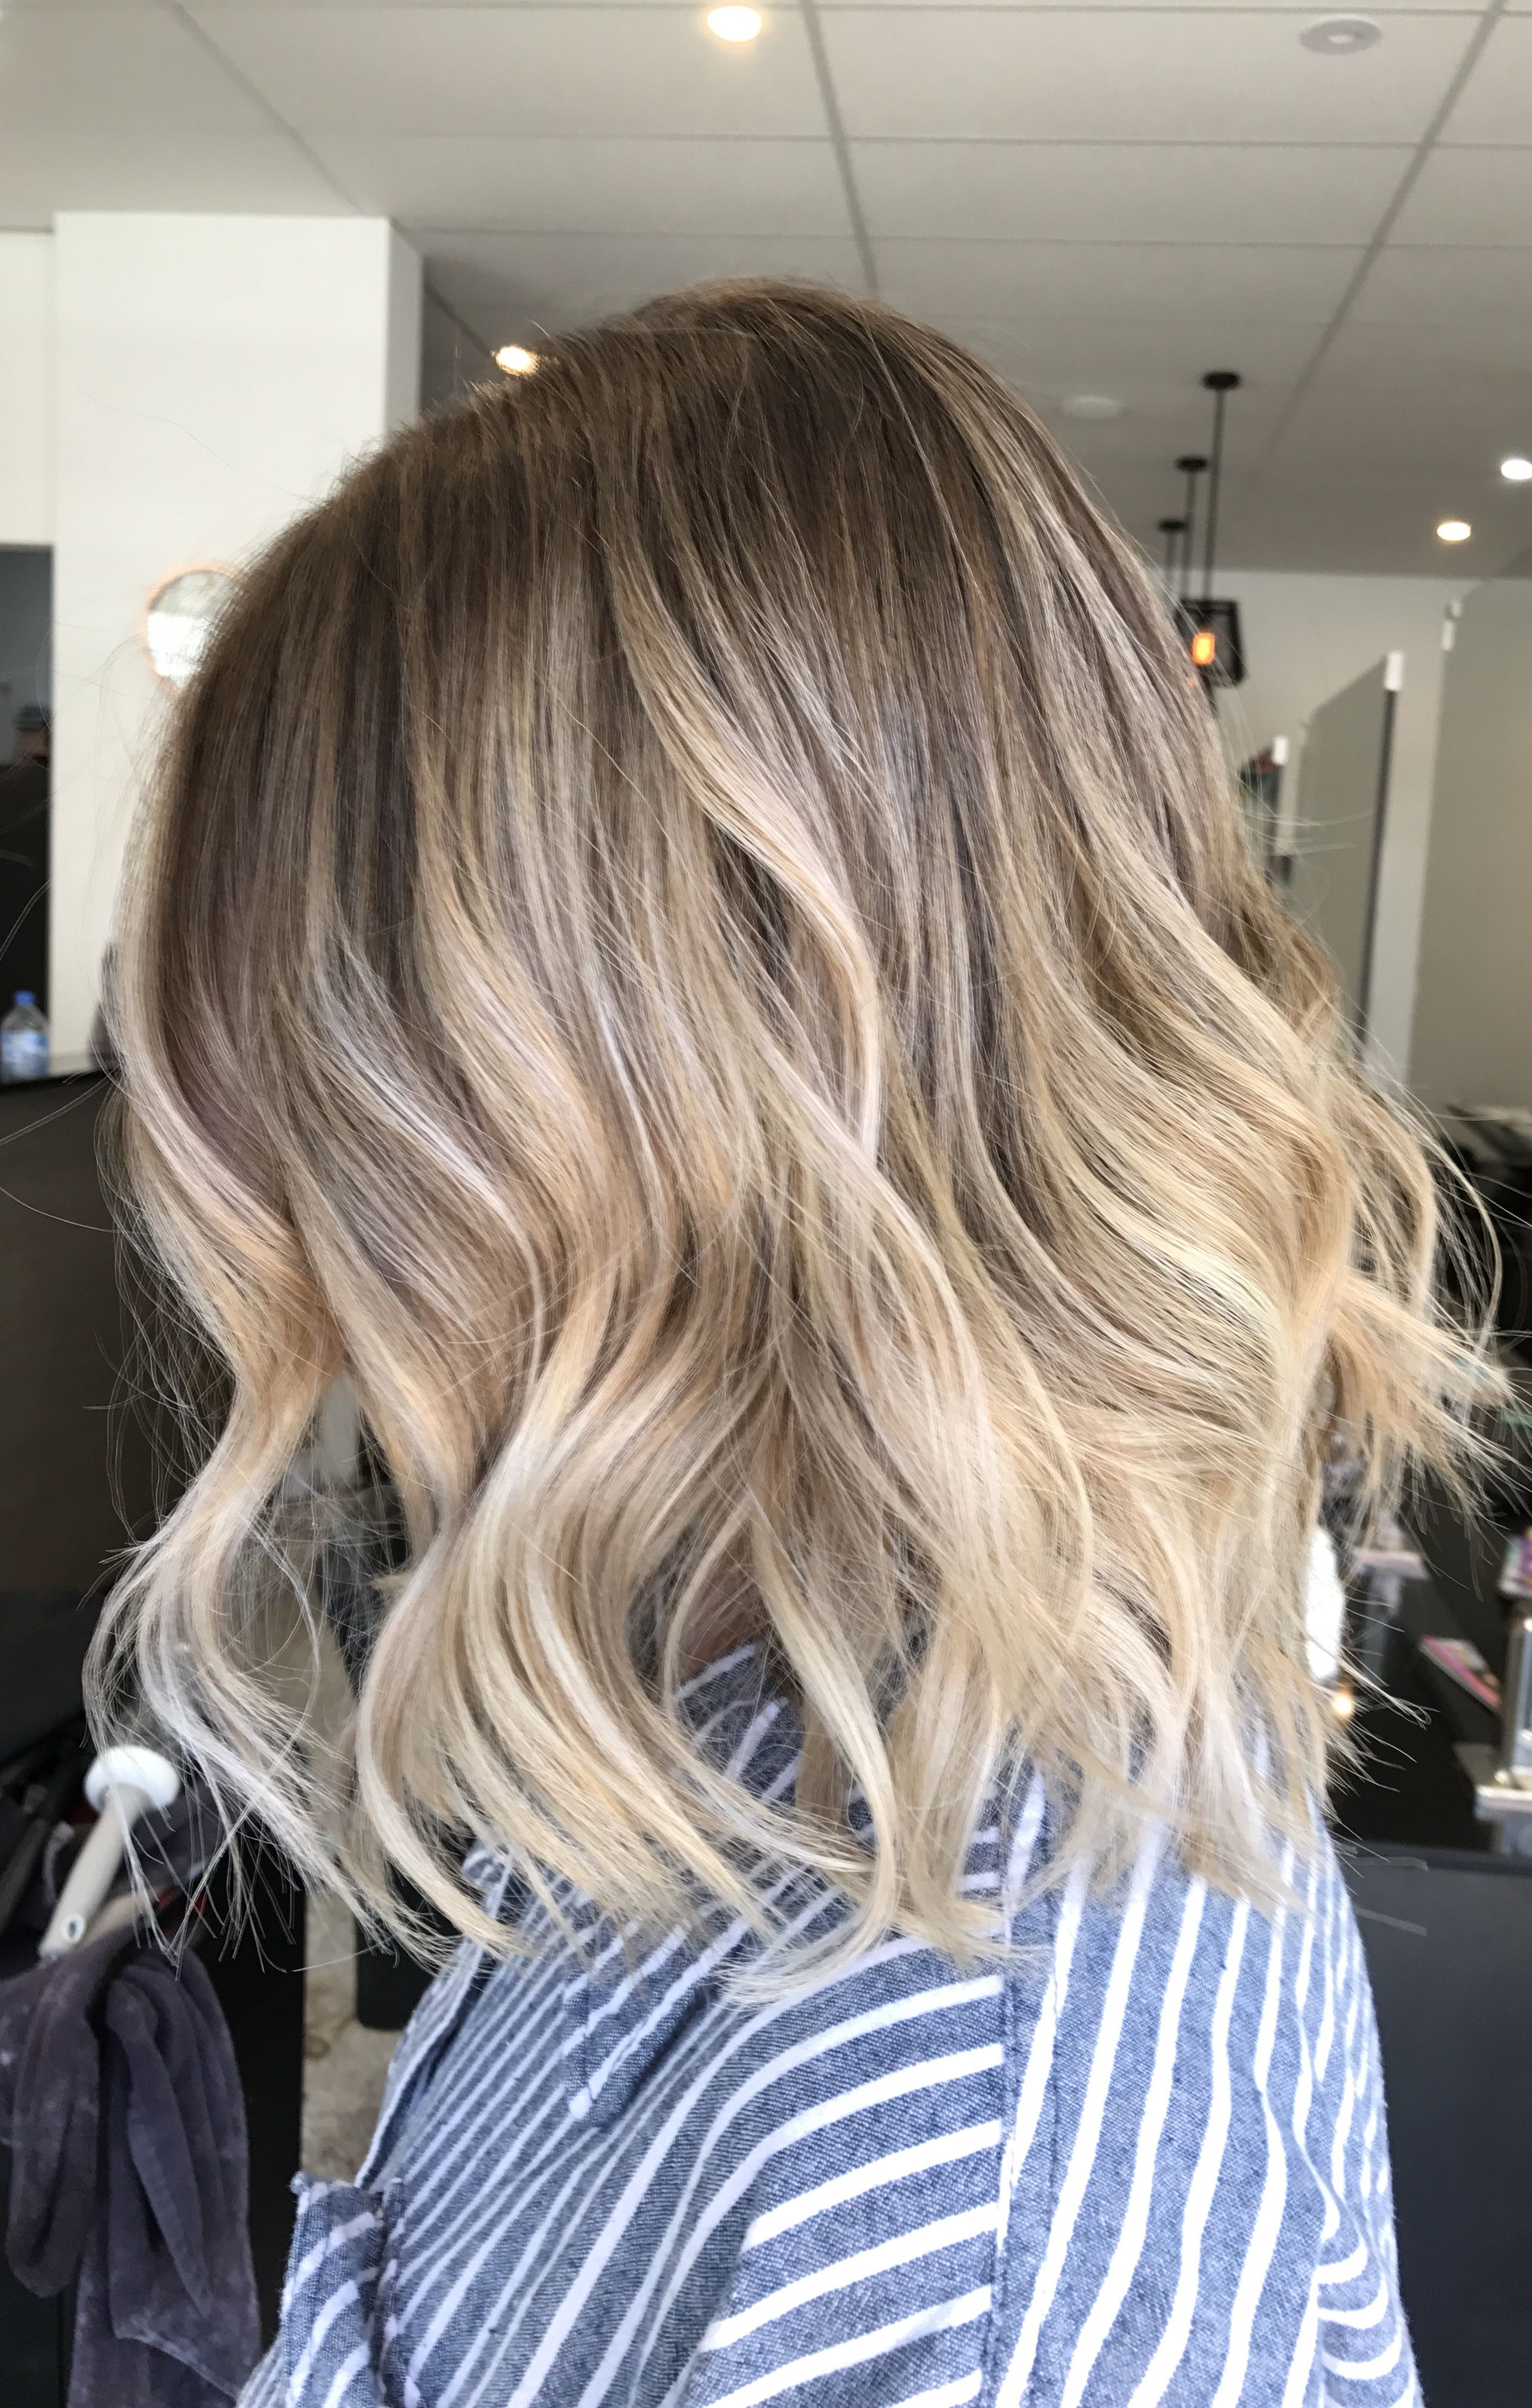 Lived In Hair Colour Blonde Bronde Brunette Golden Tones Balayage